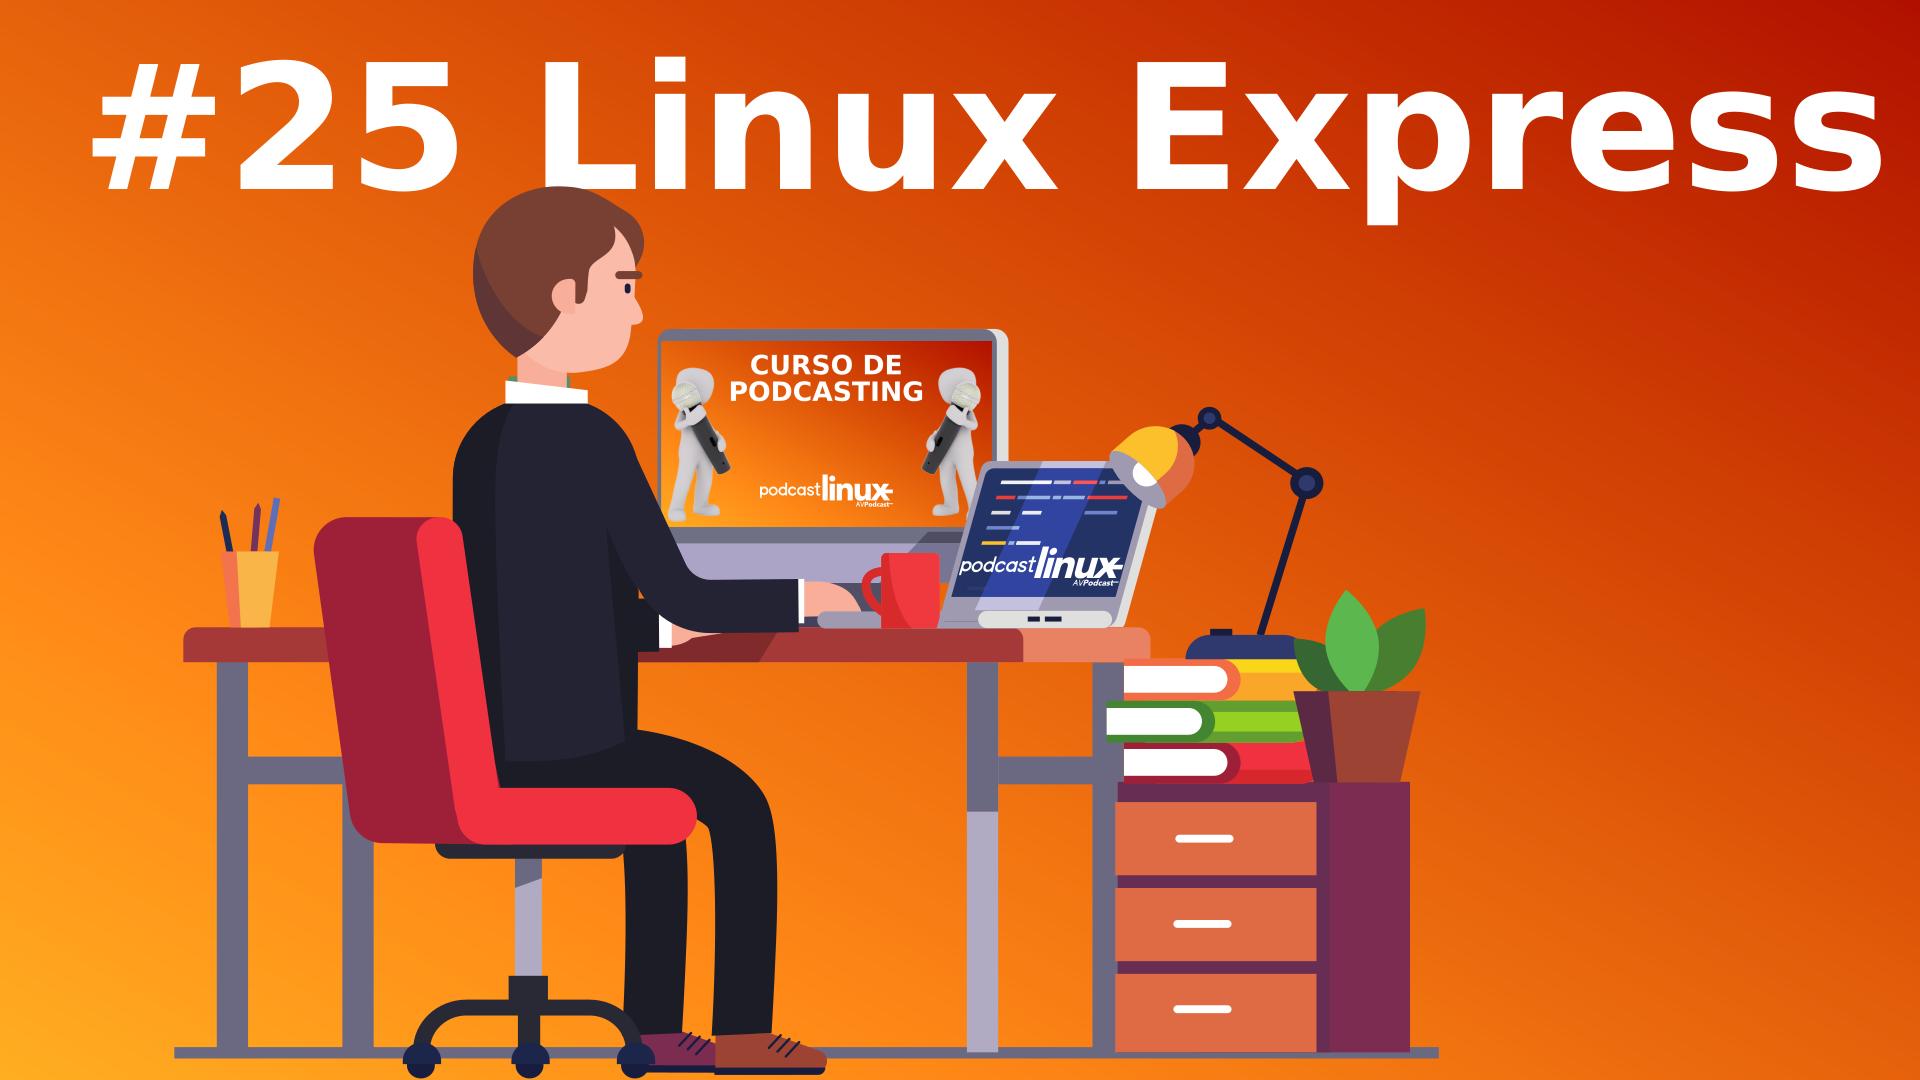 #25 Linux Express